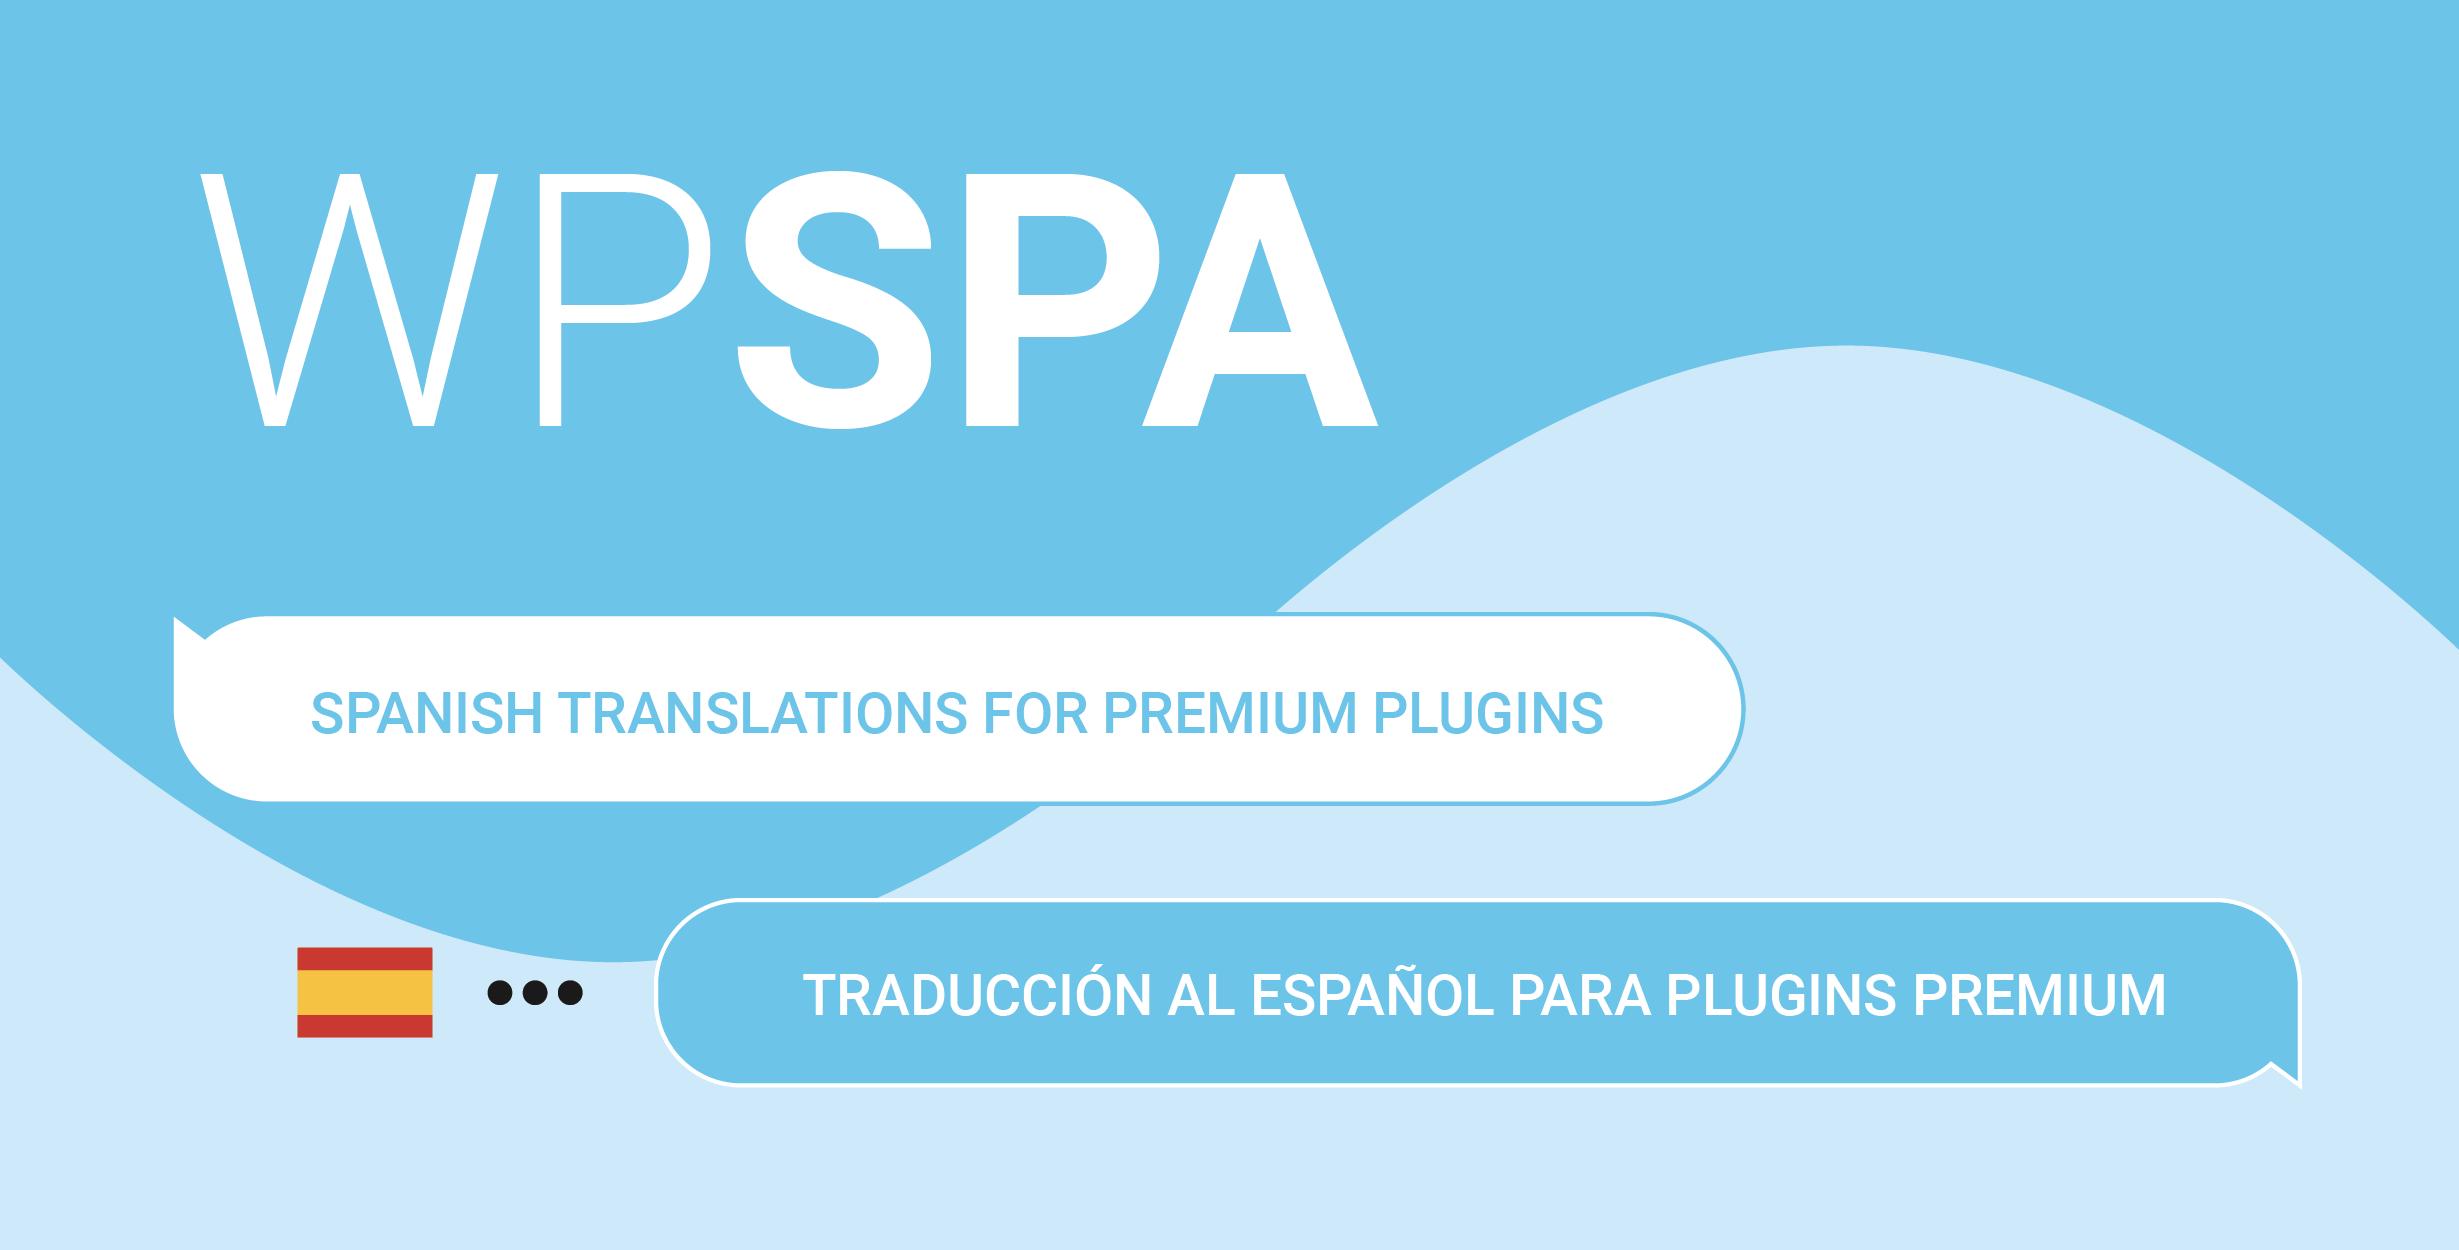 WPSPA Plugins premiums de WooCommerce traducidos al Español